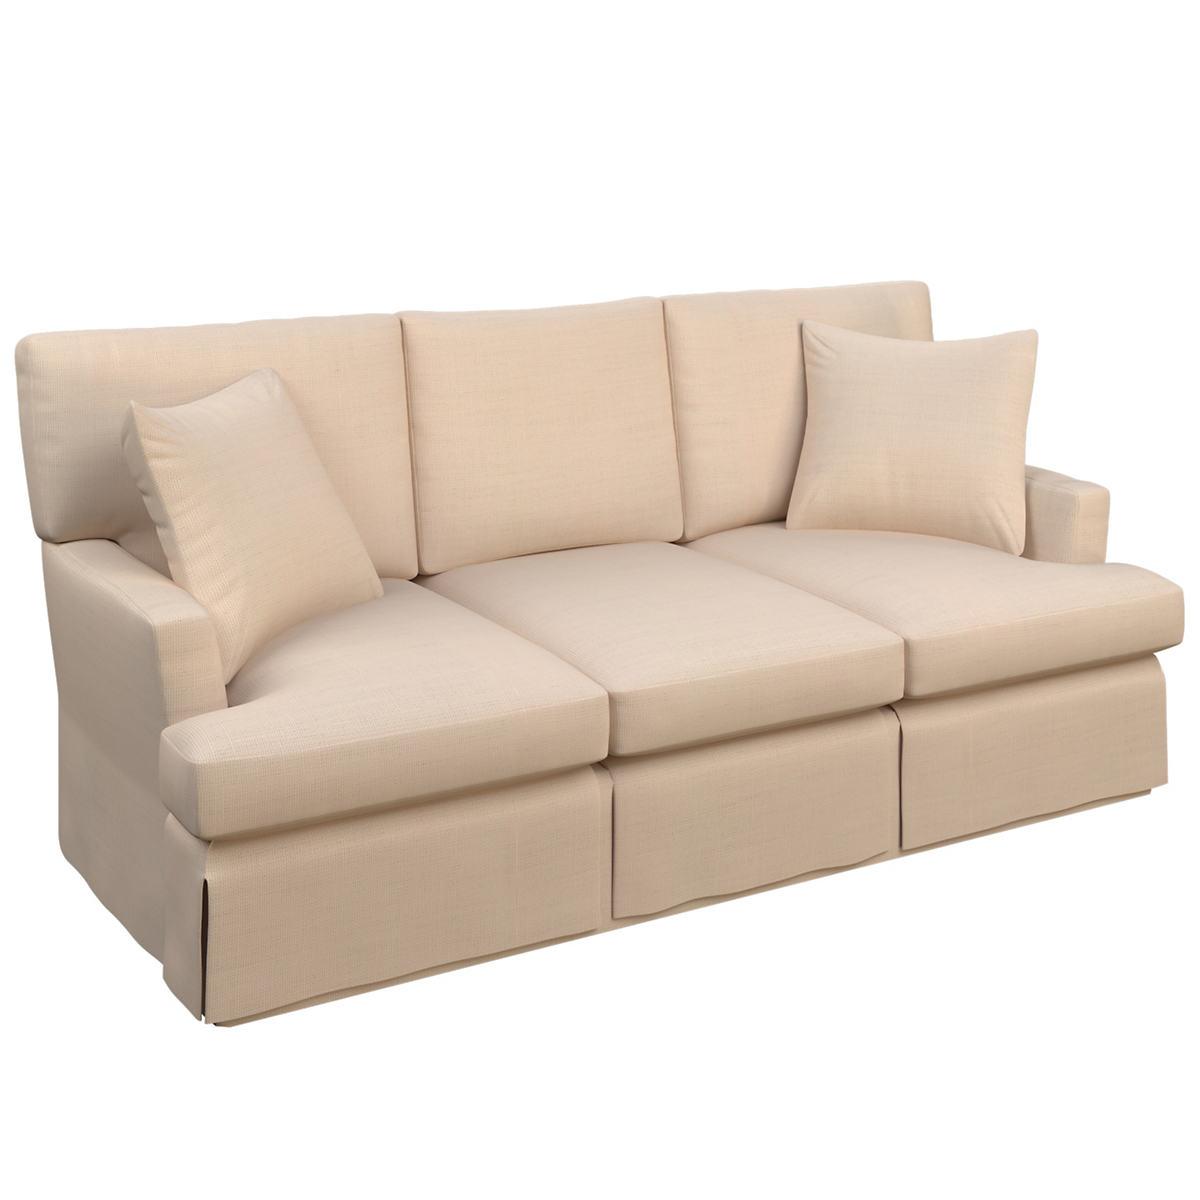 Solstice Petal Saybrook 3 Seater Sofa